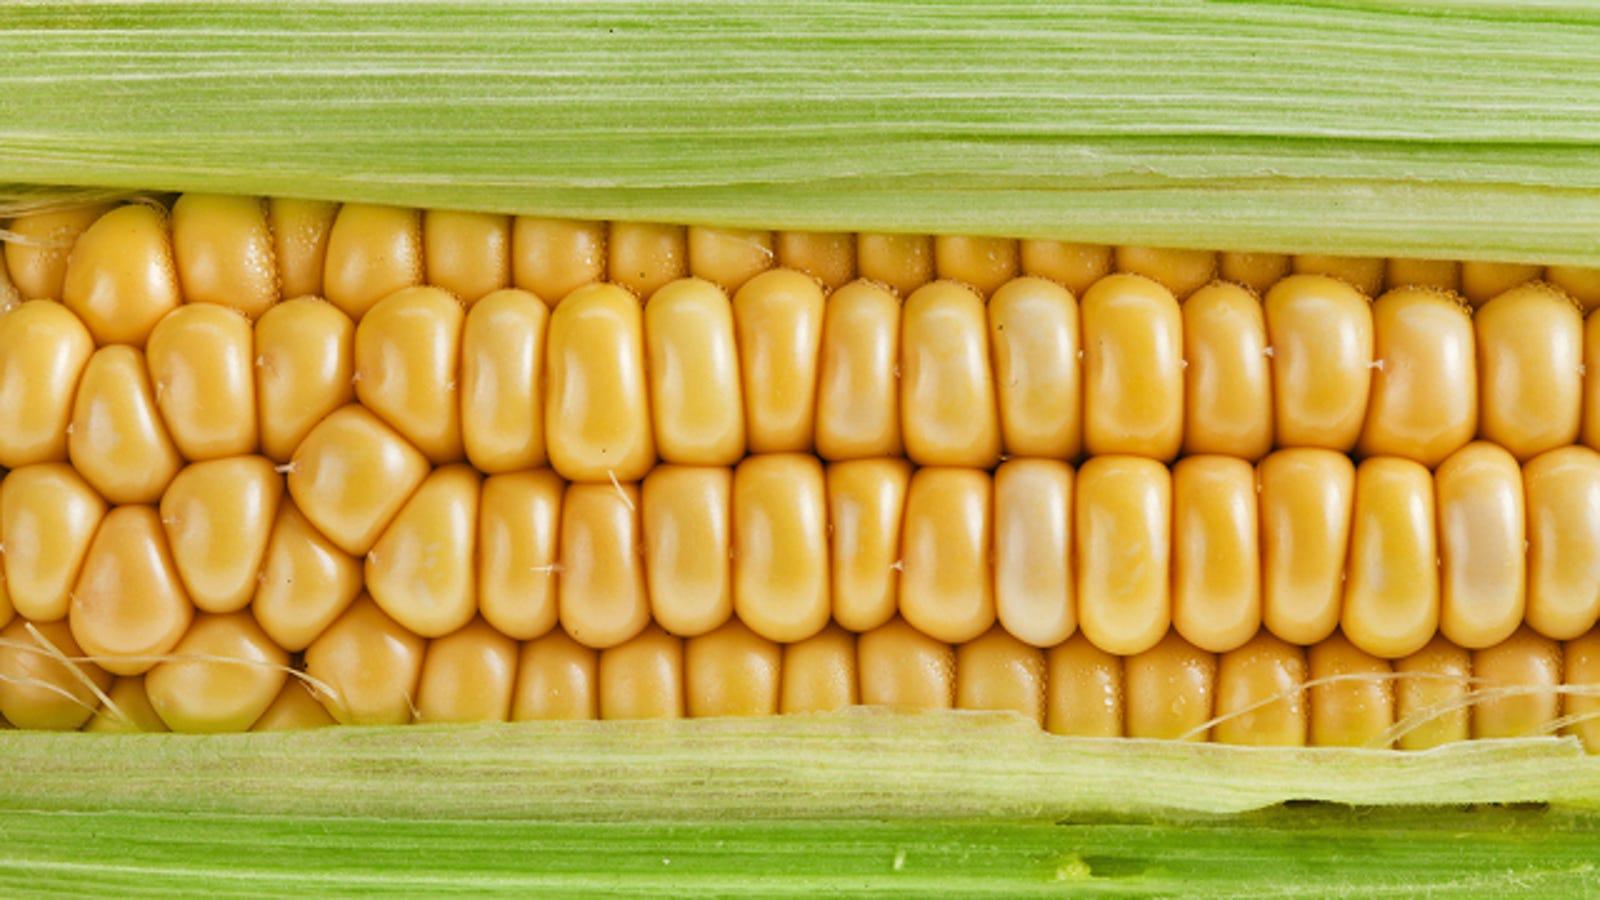 Good crop, bad crop: French scientists dismiss Monsanto